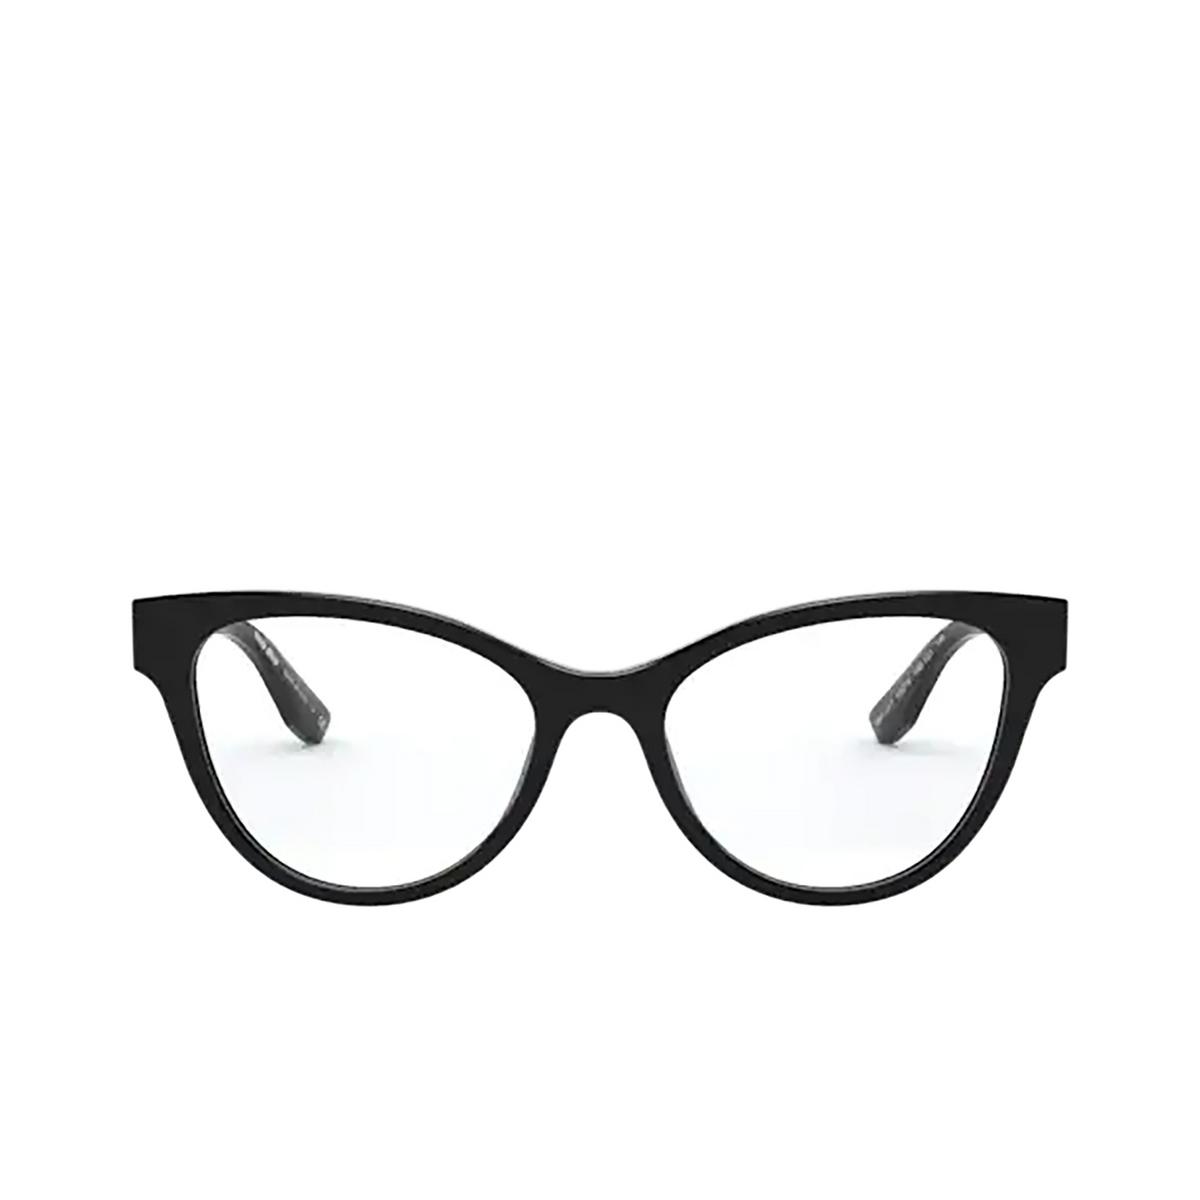 Miu Miu® Butterfly Eyeglasses: MU 01TV color Black 1AB1O1.